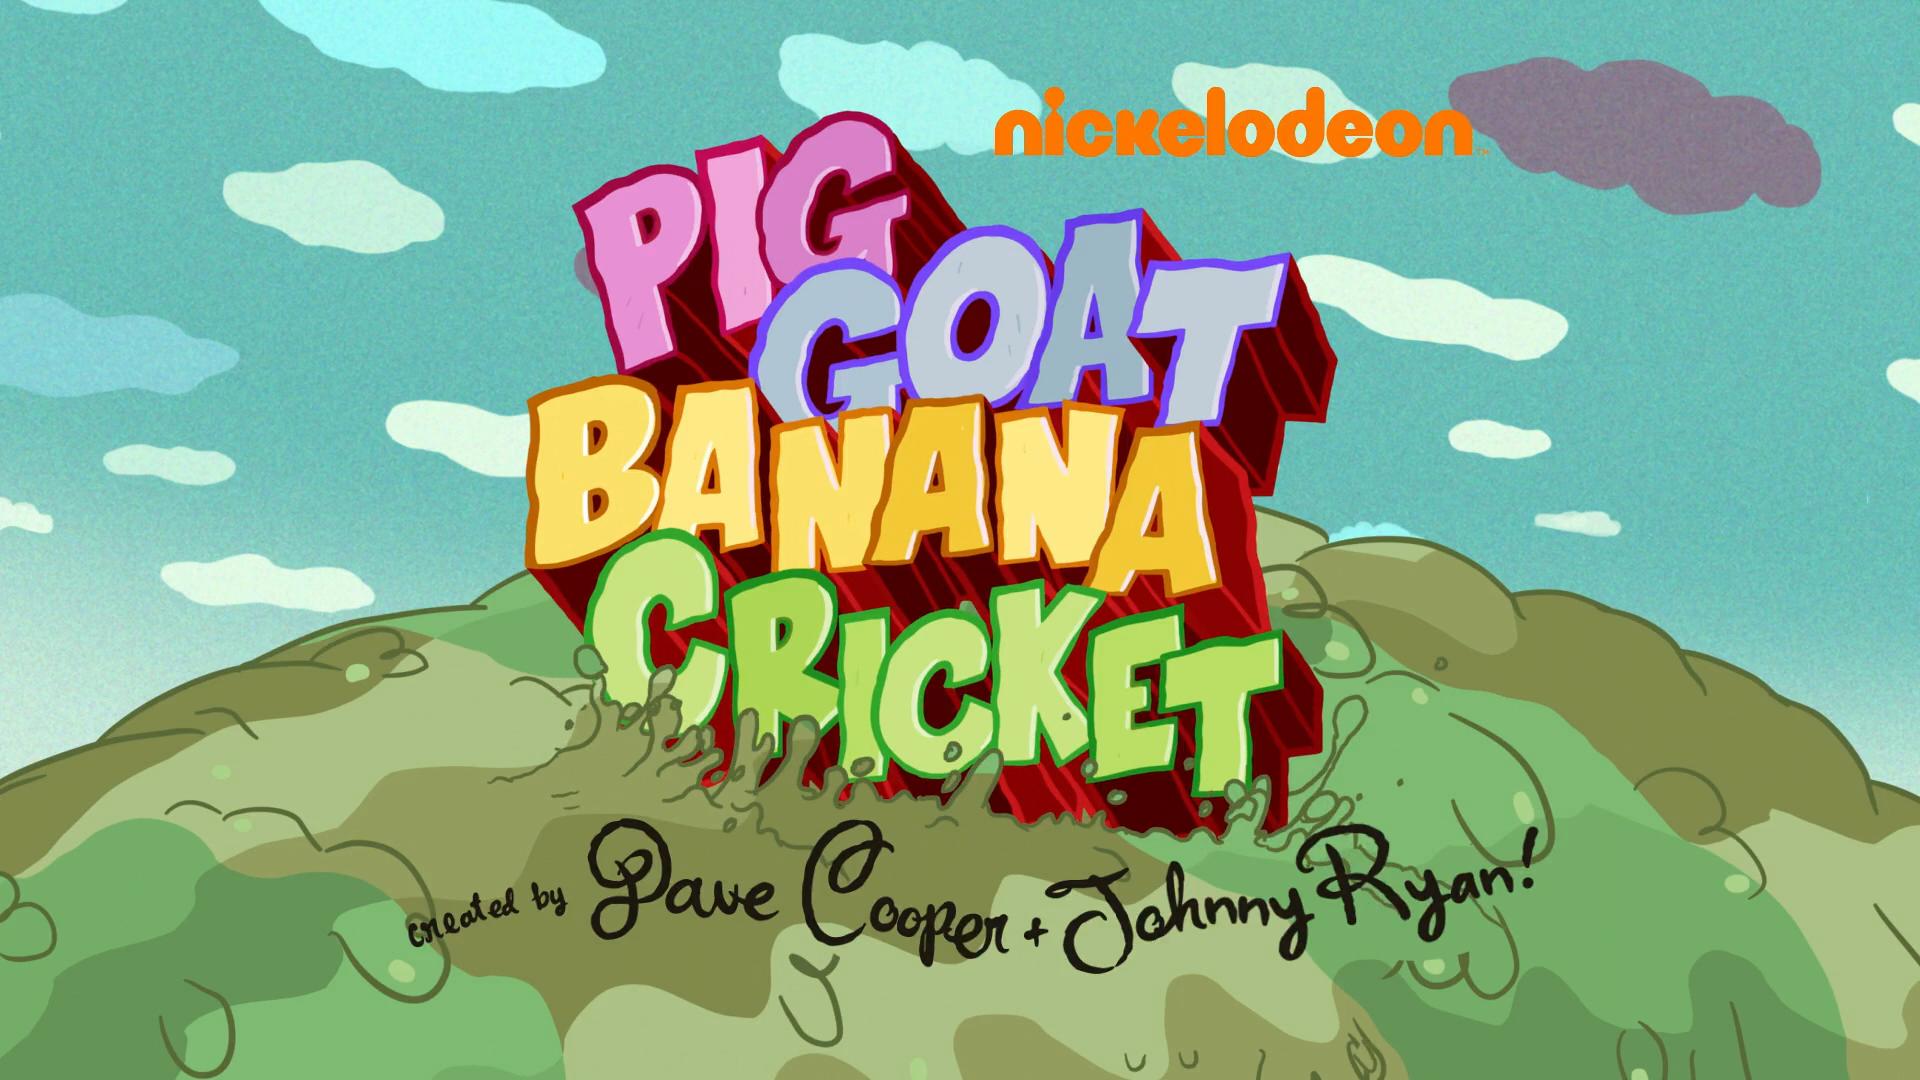 File:Pig-Goat-Banana-Cricket-Logo-Title.png